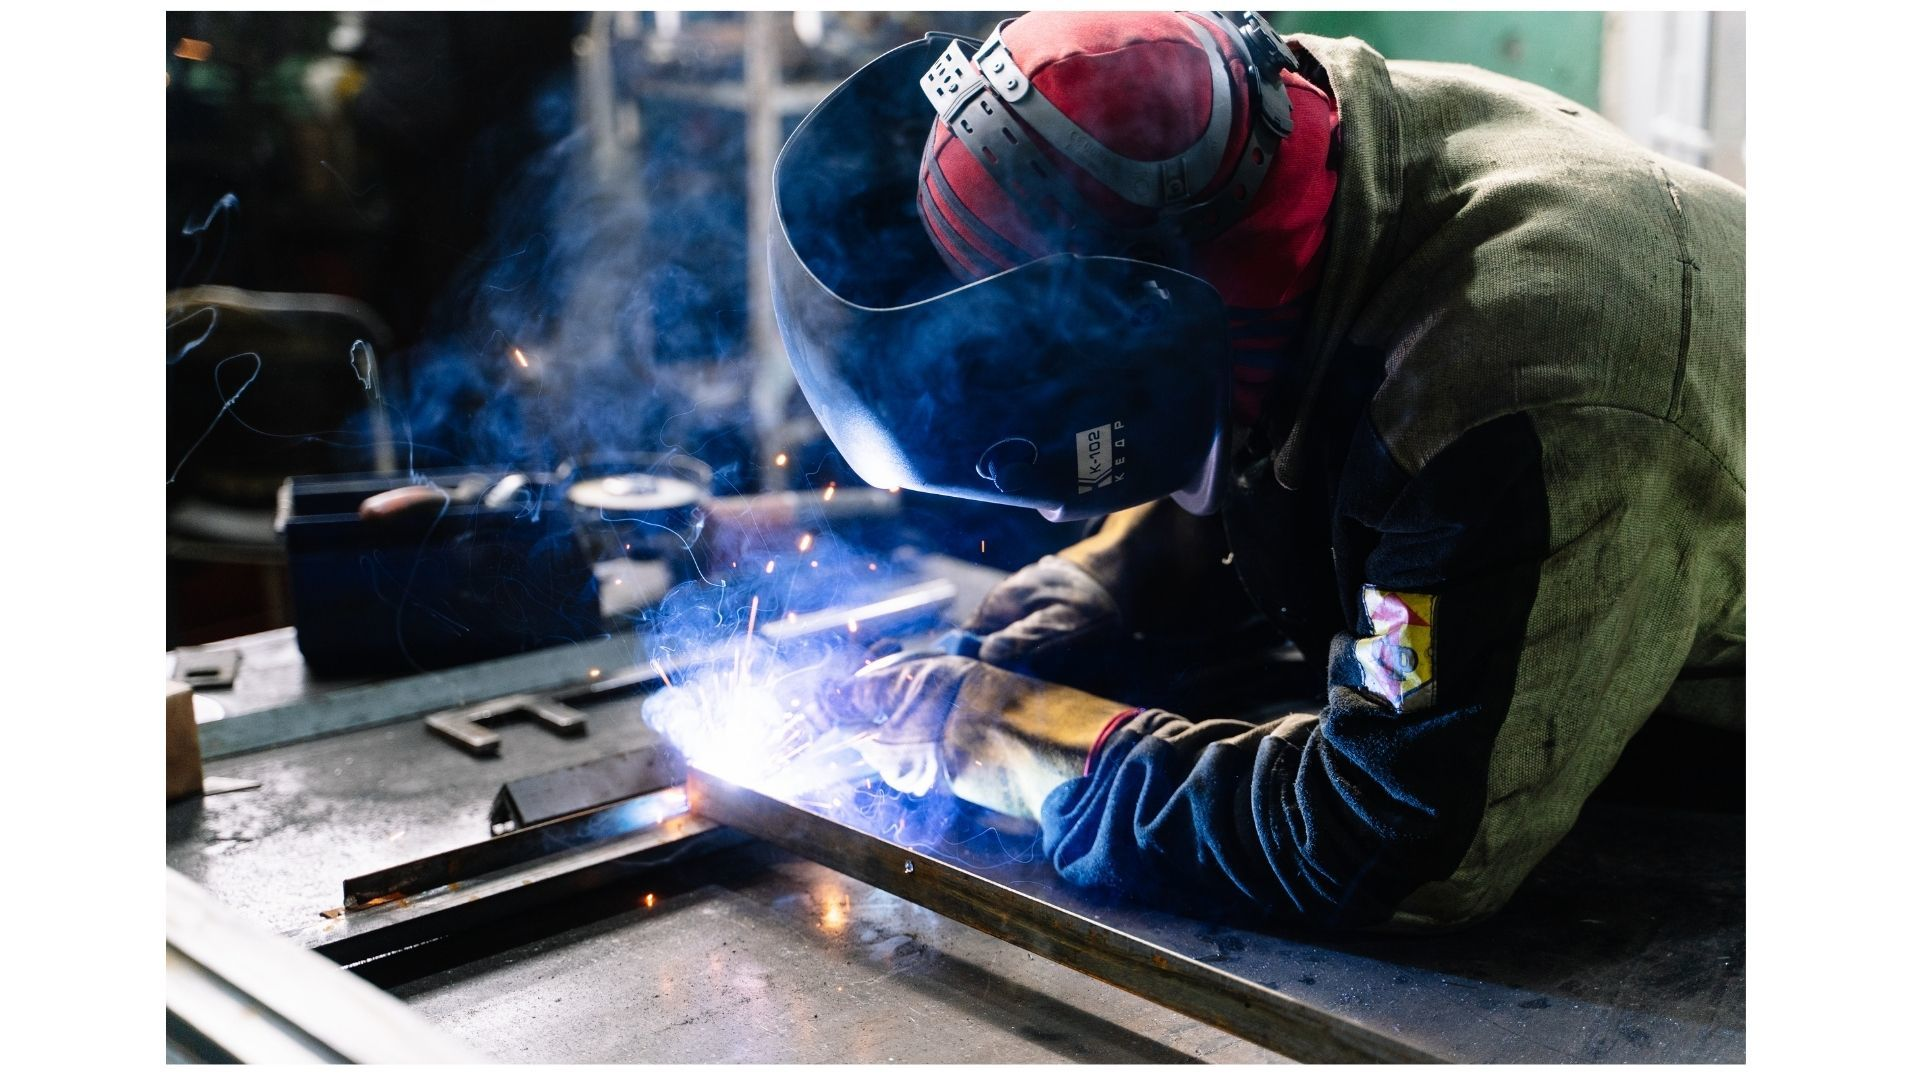 【Toyama, Shimonikawa】 Manufactures auto parts at the factory